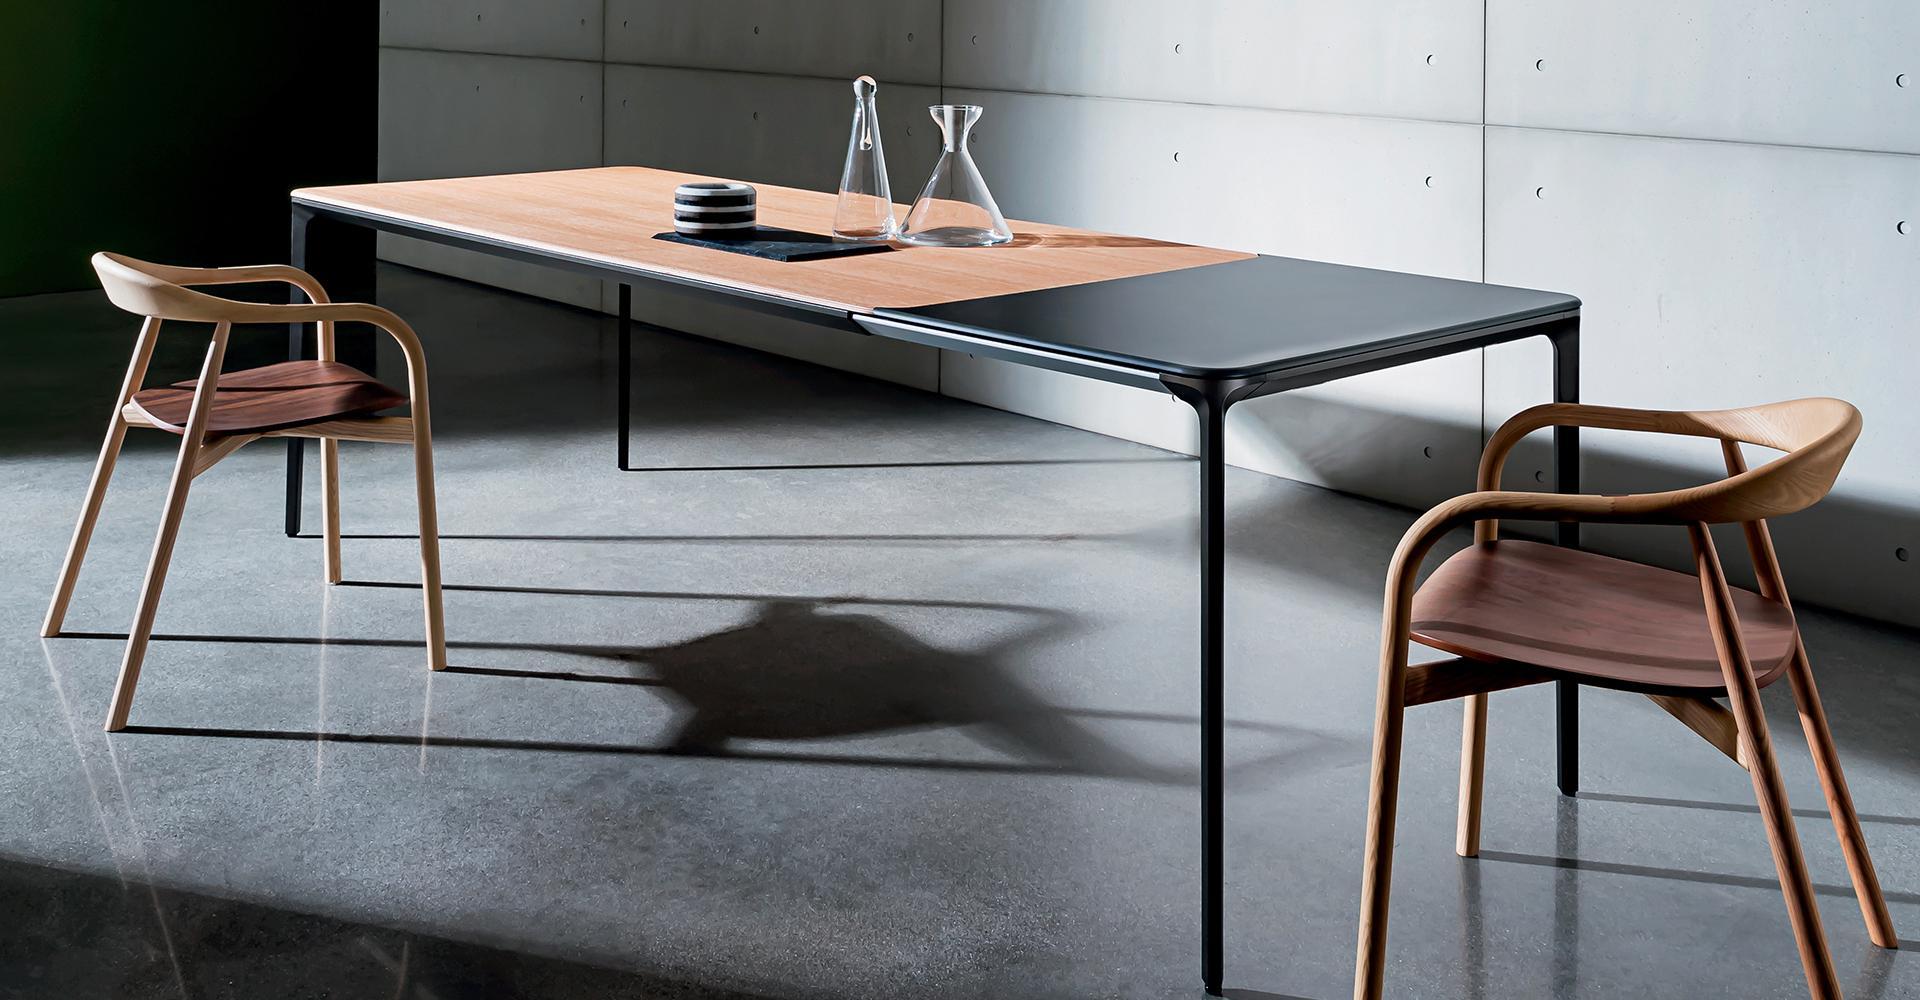 Ceppo Di Legno Tavolino slim extensible | dining table extensible for interiors - sovet